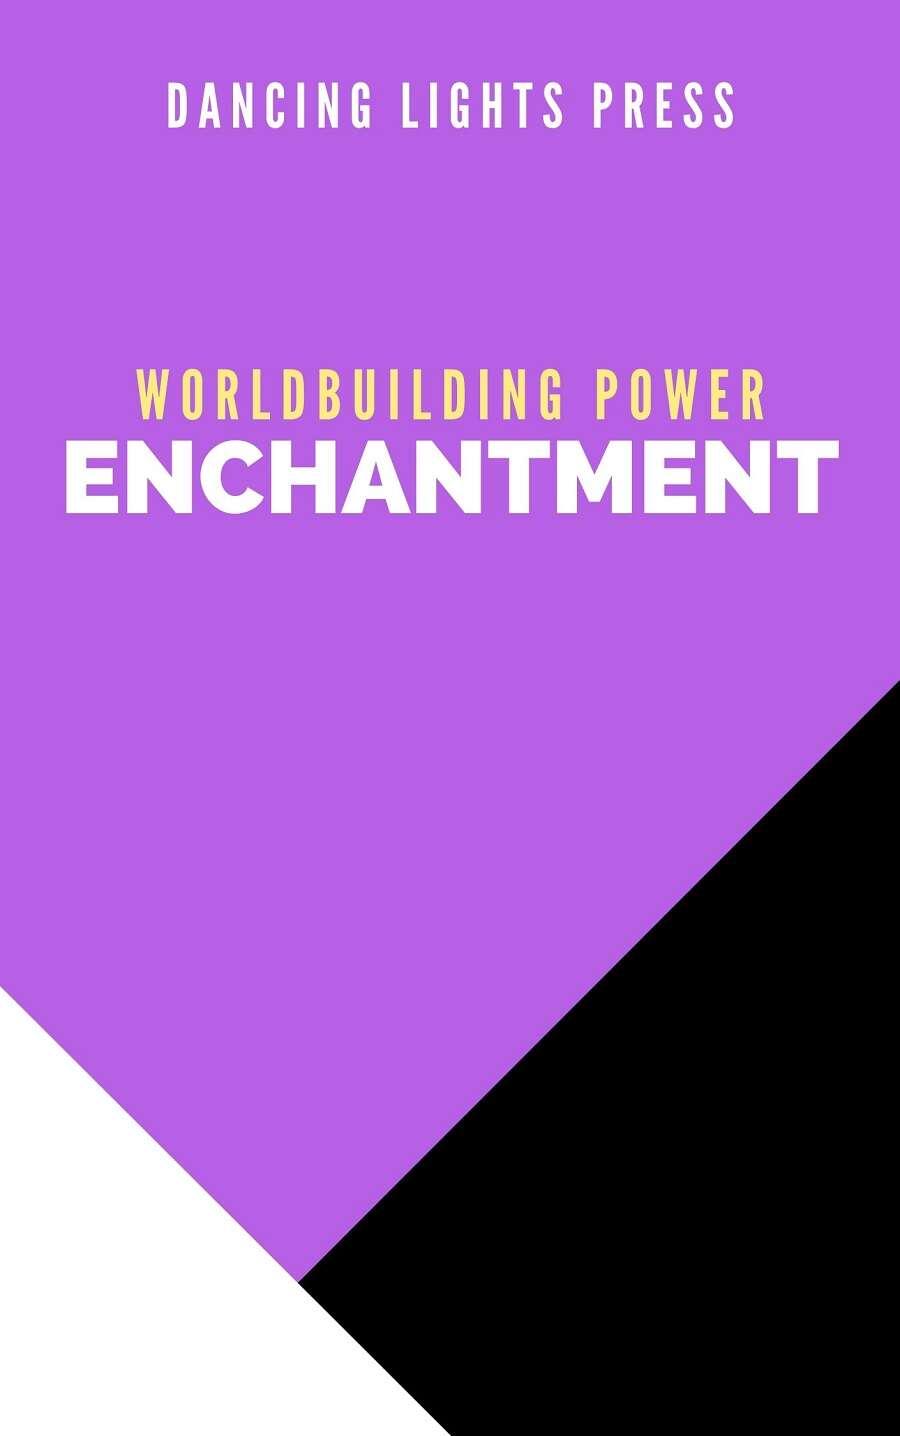 Worldbuilding Power: Enchantment